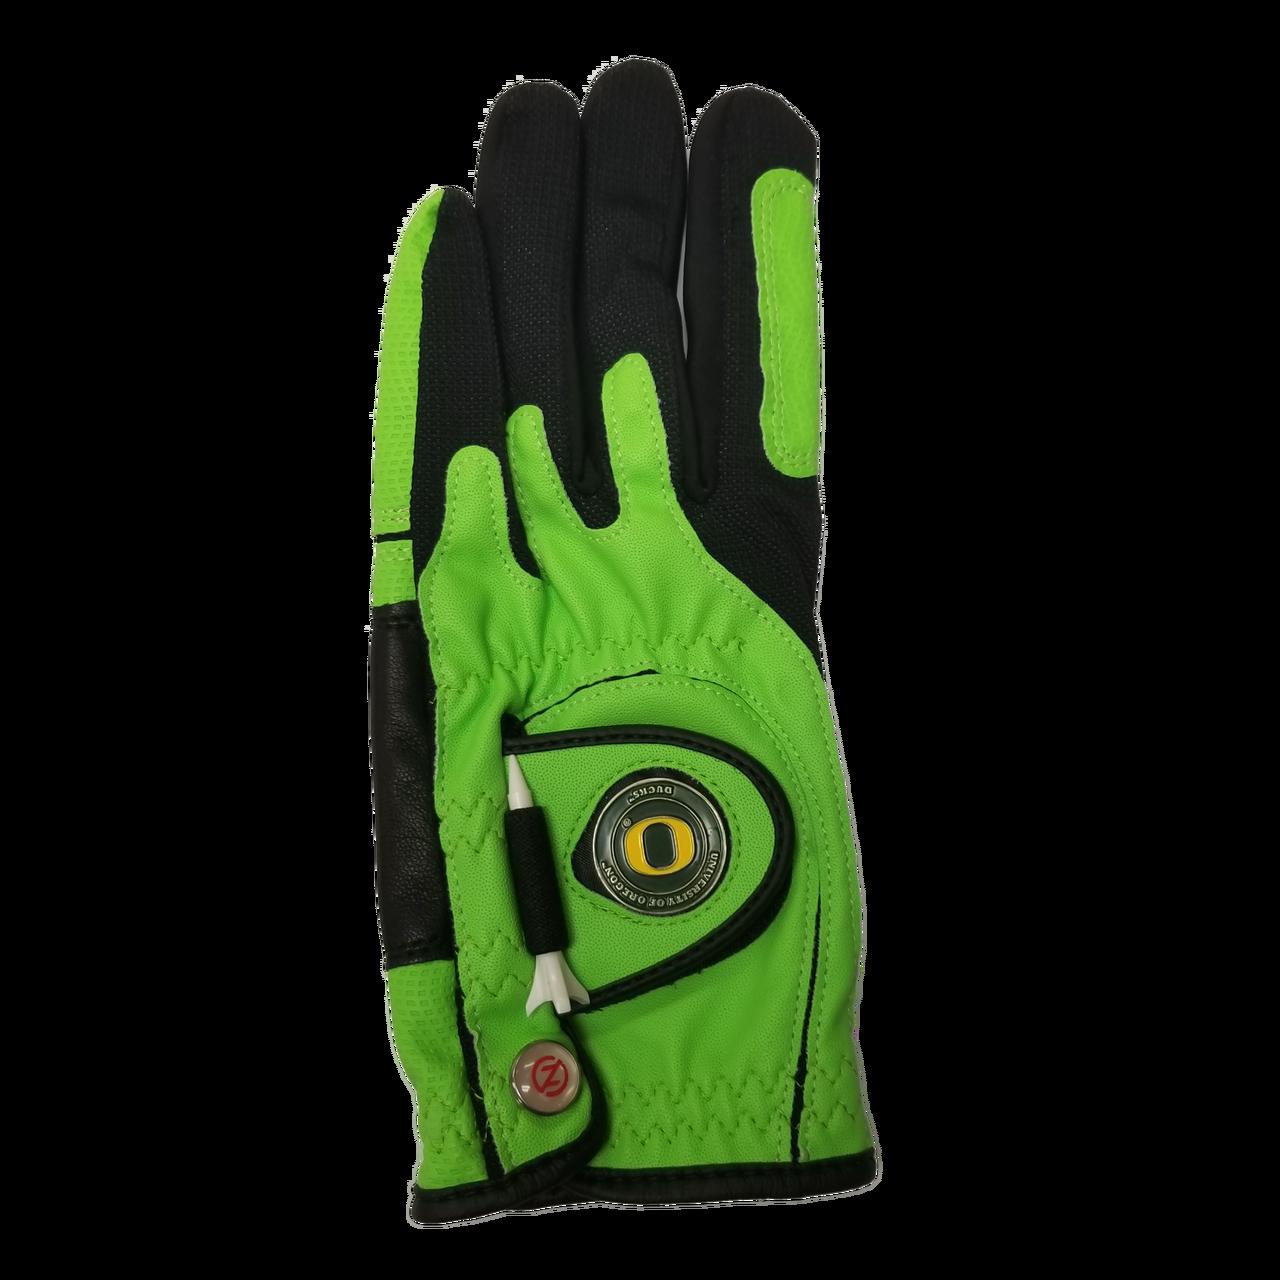 Zero Friction Oregon Ducks Golf Glove (Green)